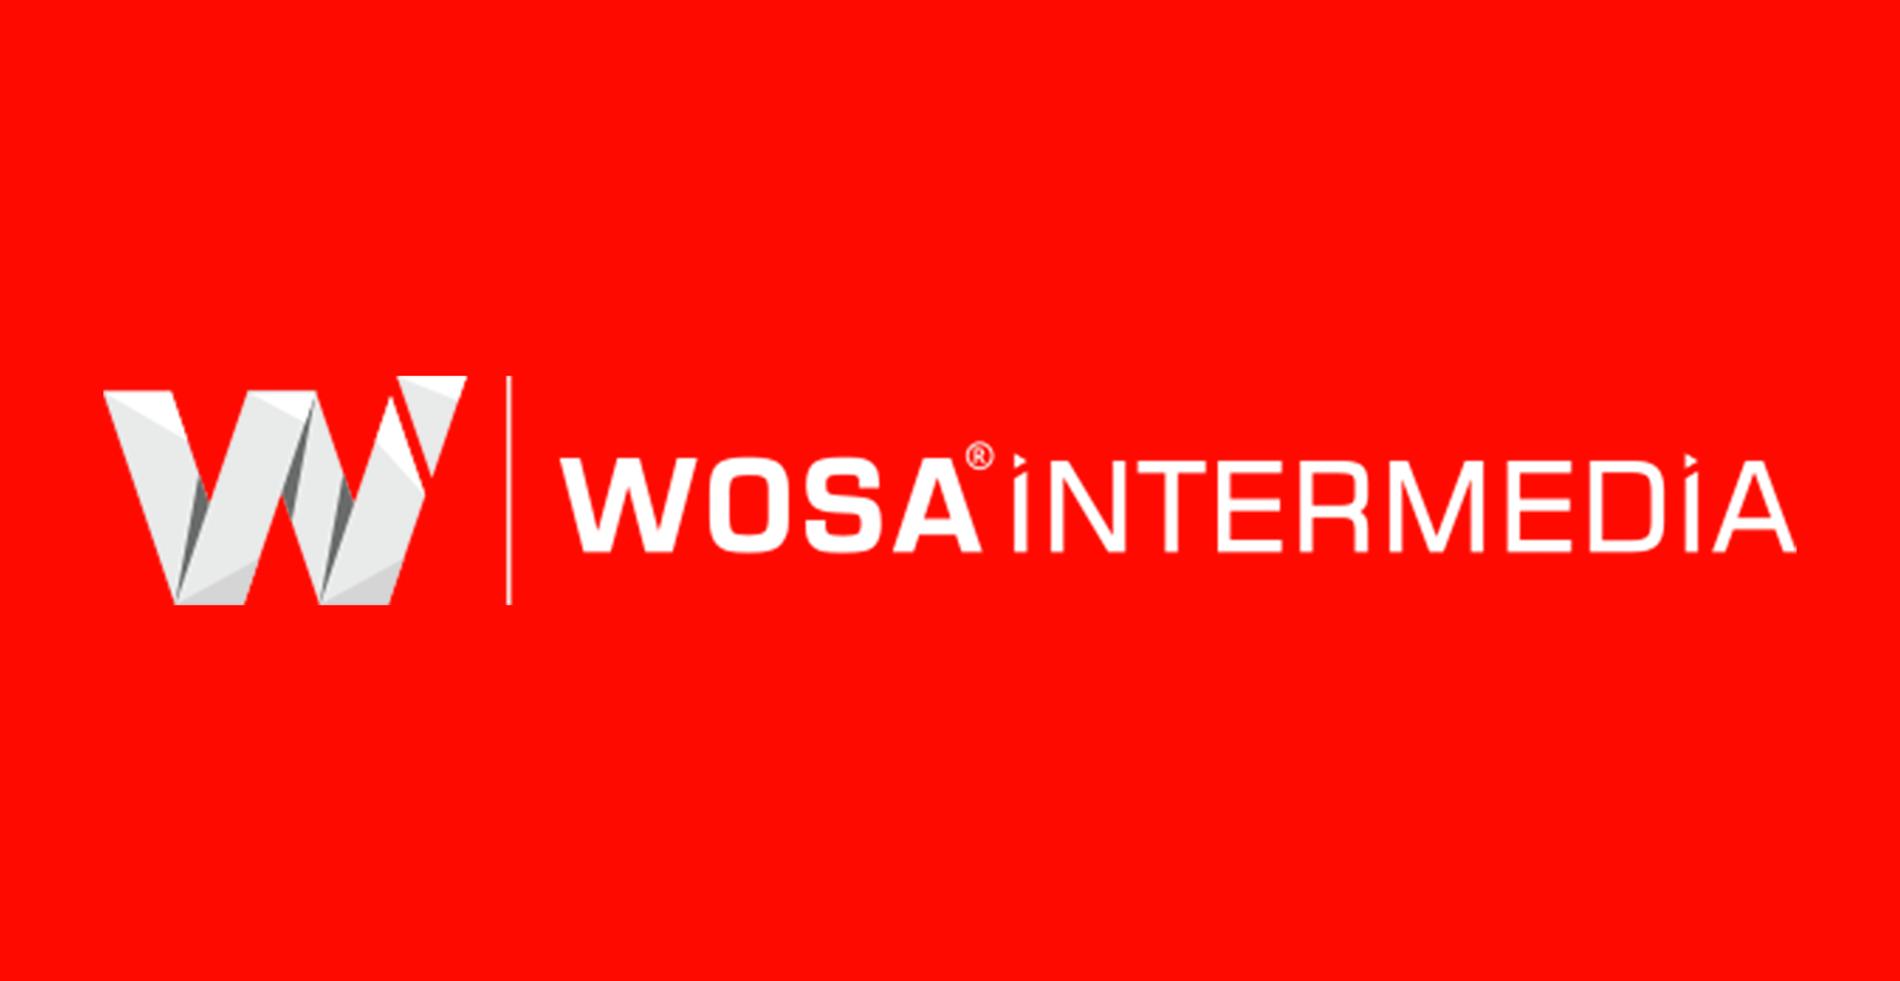 Wosa Intermedia Logo